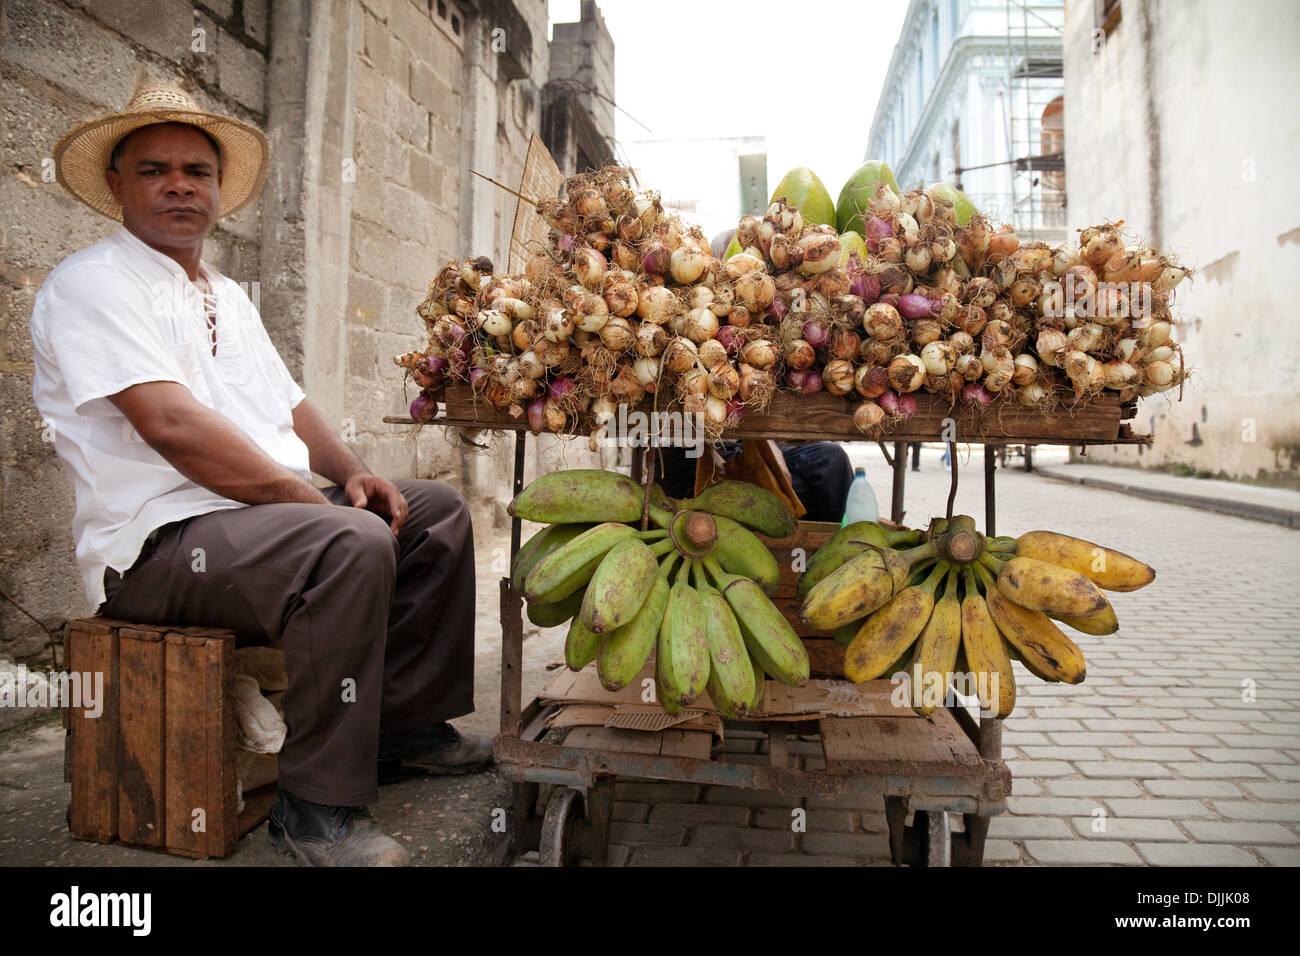 Cuba street food - A stallkeeper and his fruit stall, Brasil St, Havana, Cuba, Caribbean - Stock Image